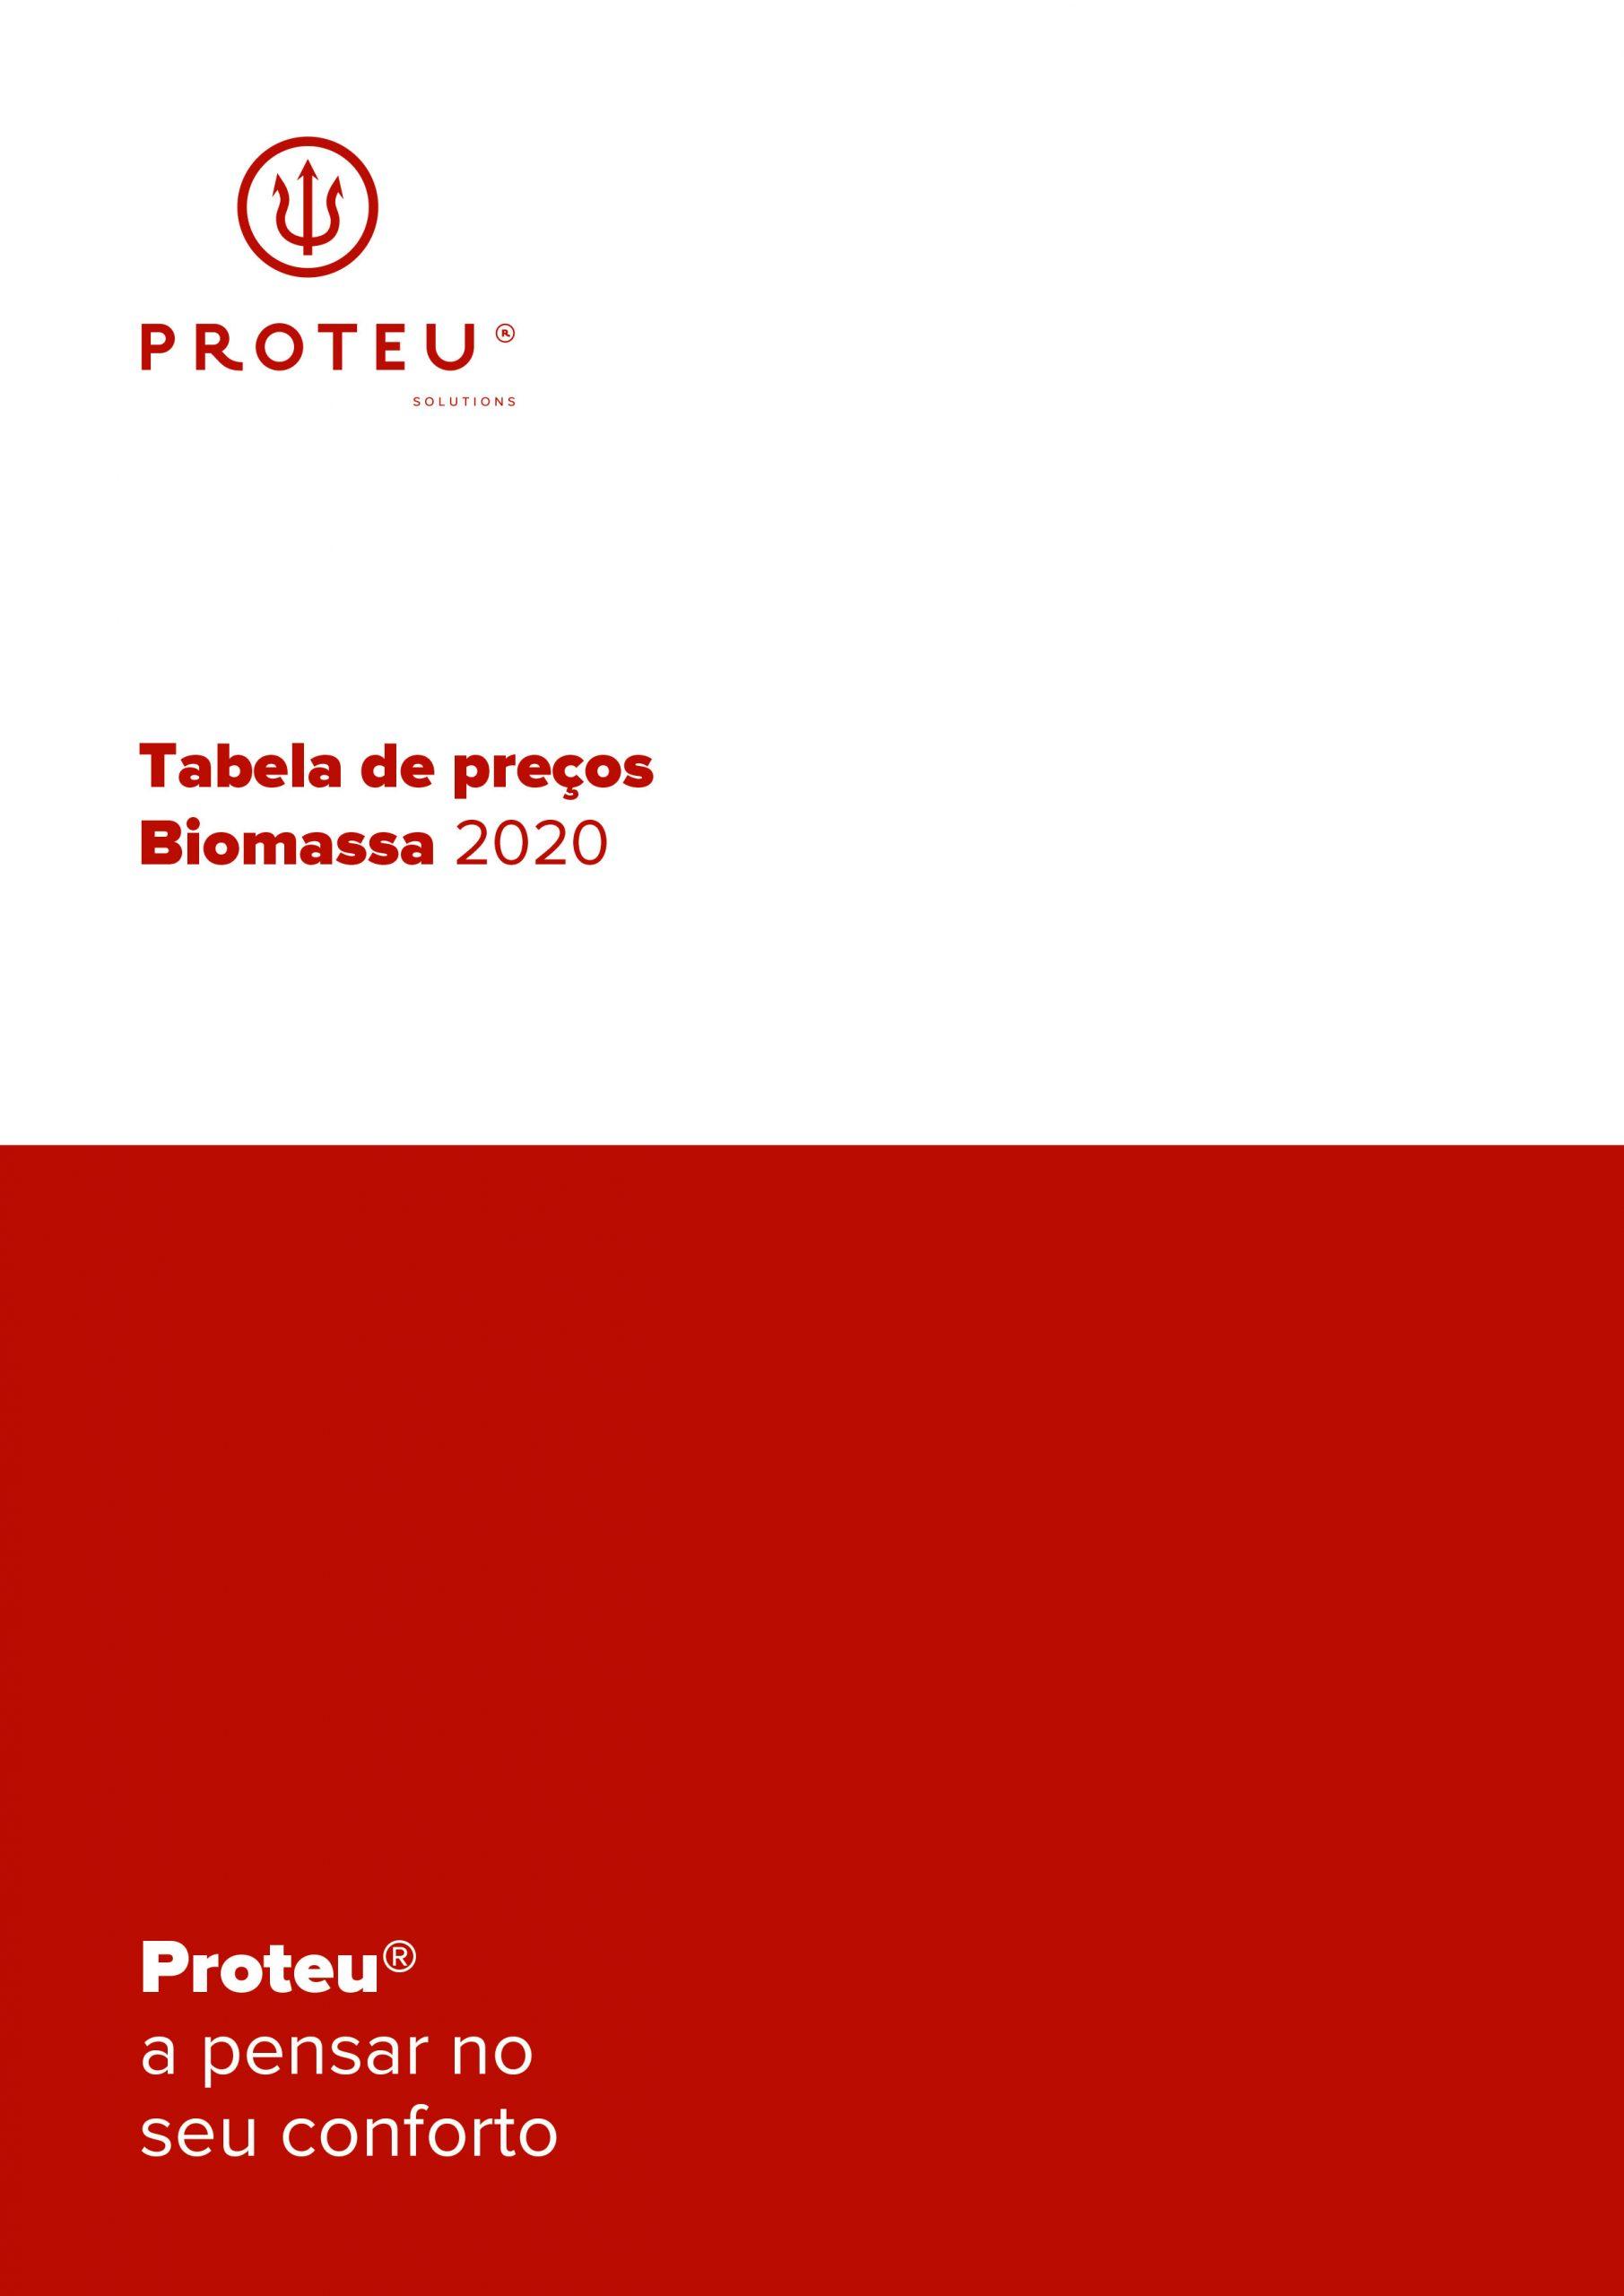 Biomassa 2020